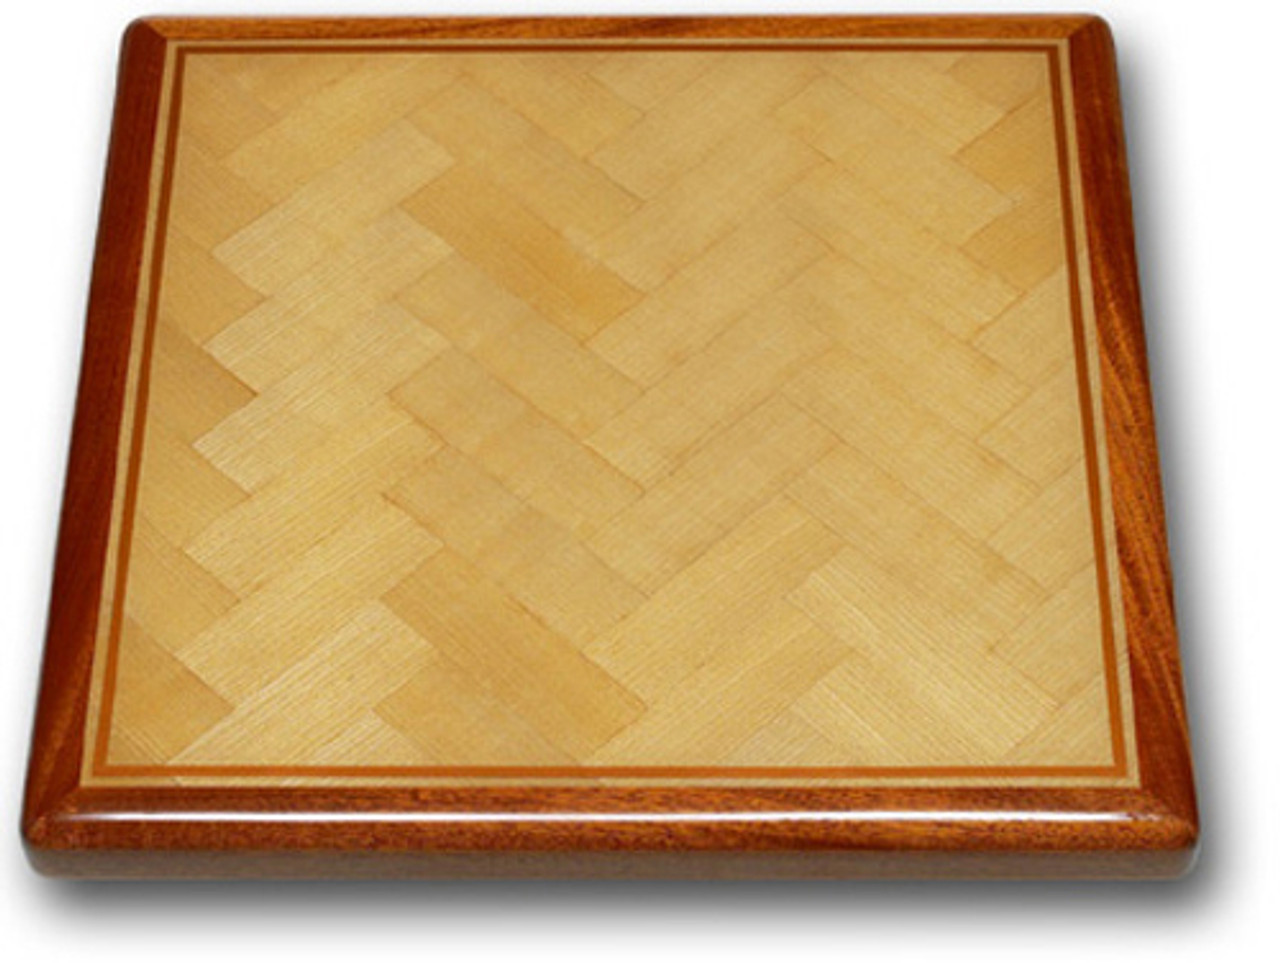 Hoffmann-MOBIL-Press-Ash-Herringbone-table-top-sample